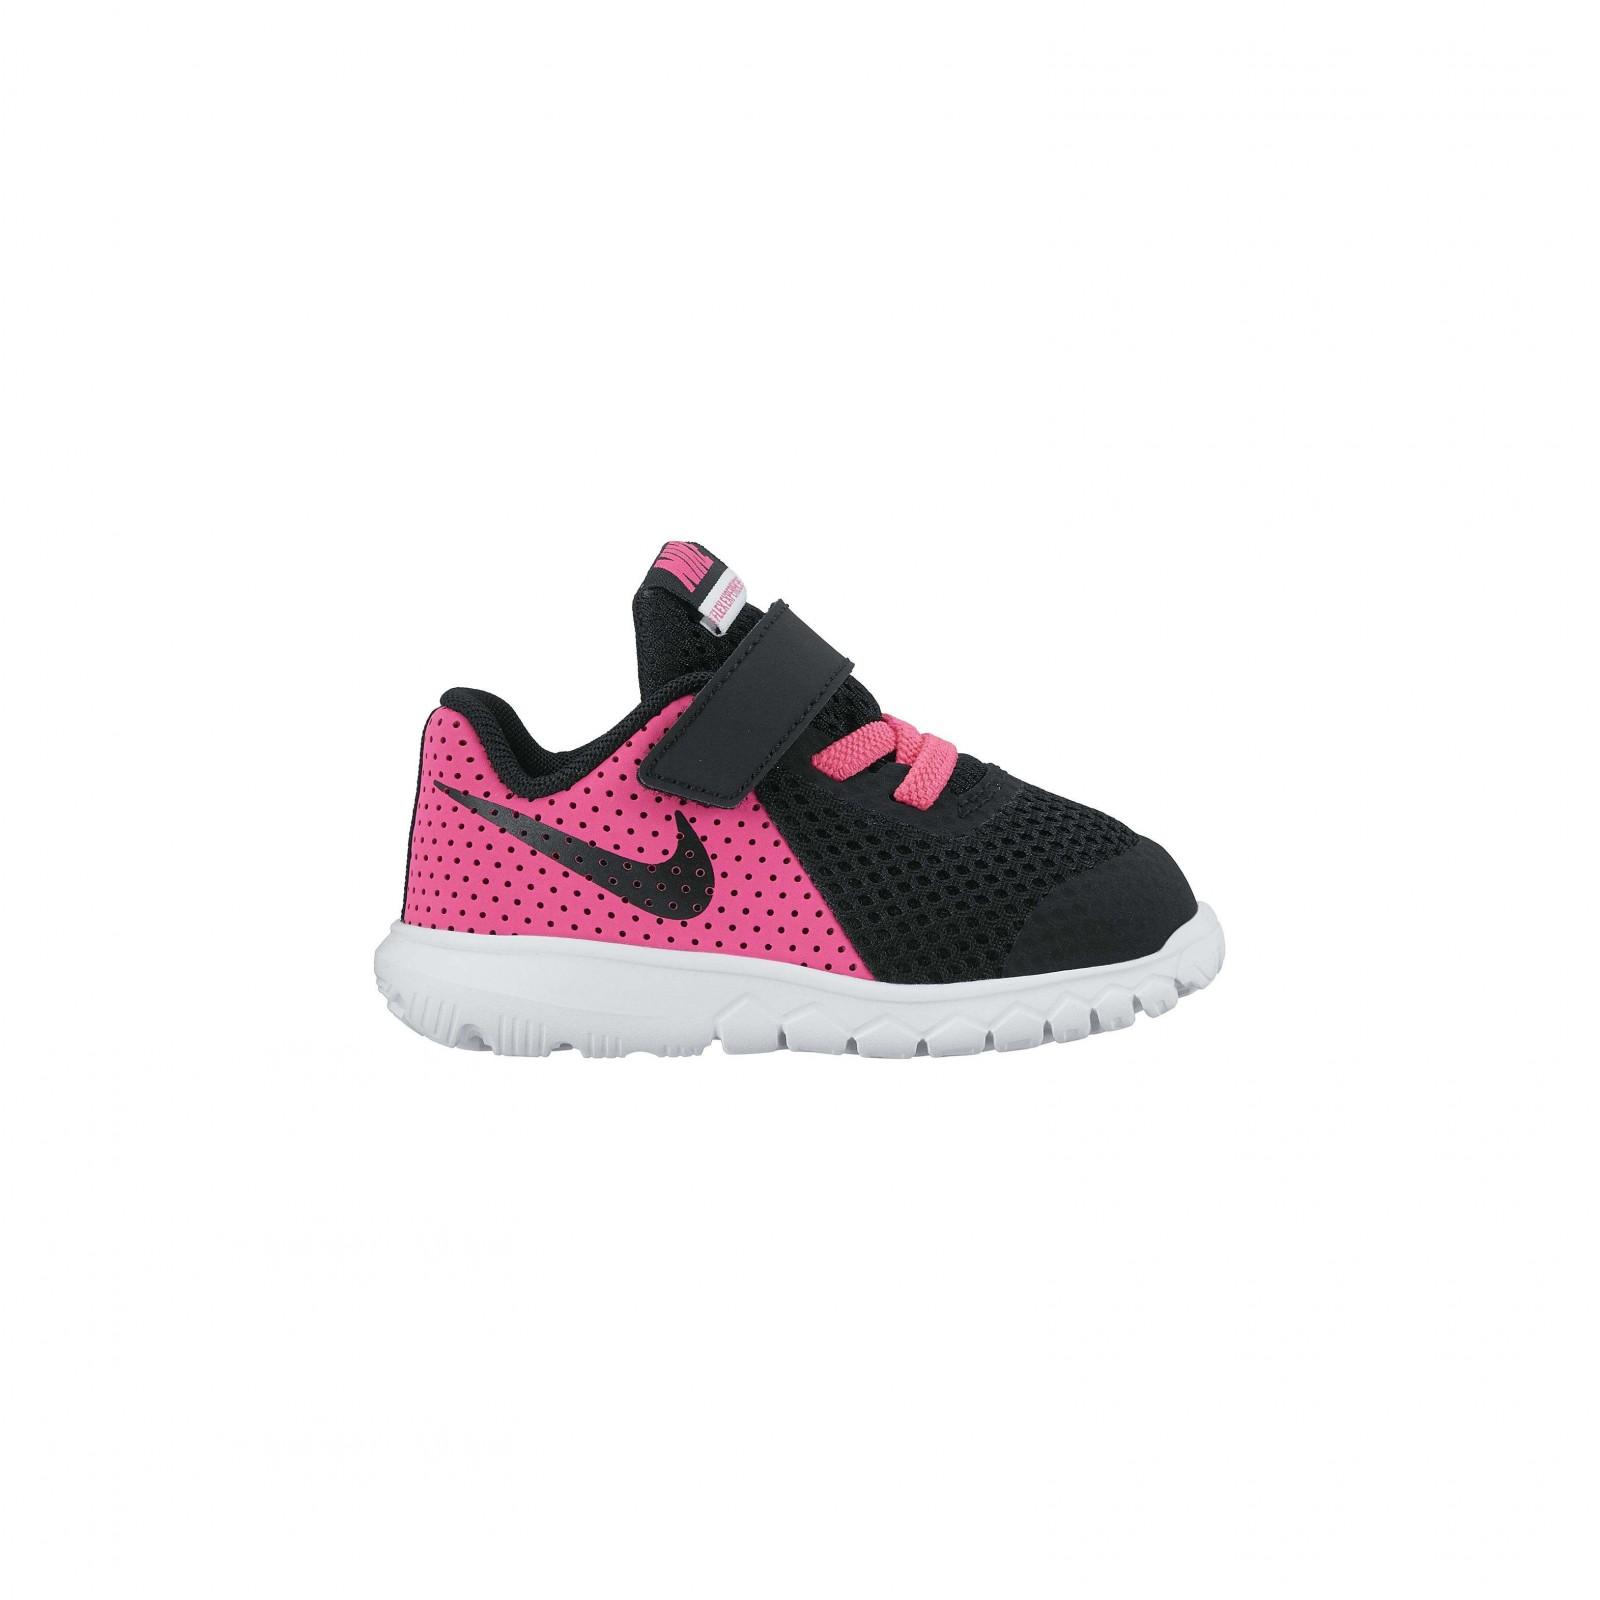 Dětské běžecké boty Nike FLEX EXPERIENCE 5 (TDV)  53bdbb47d1